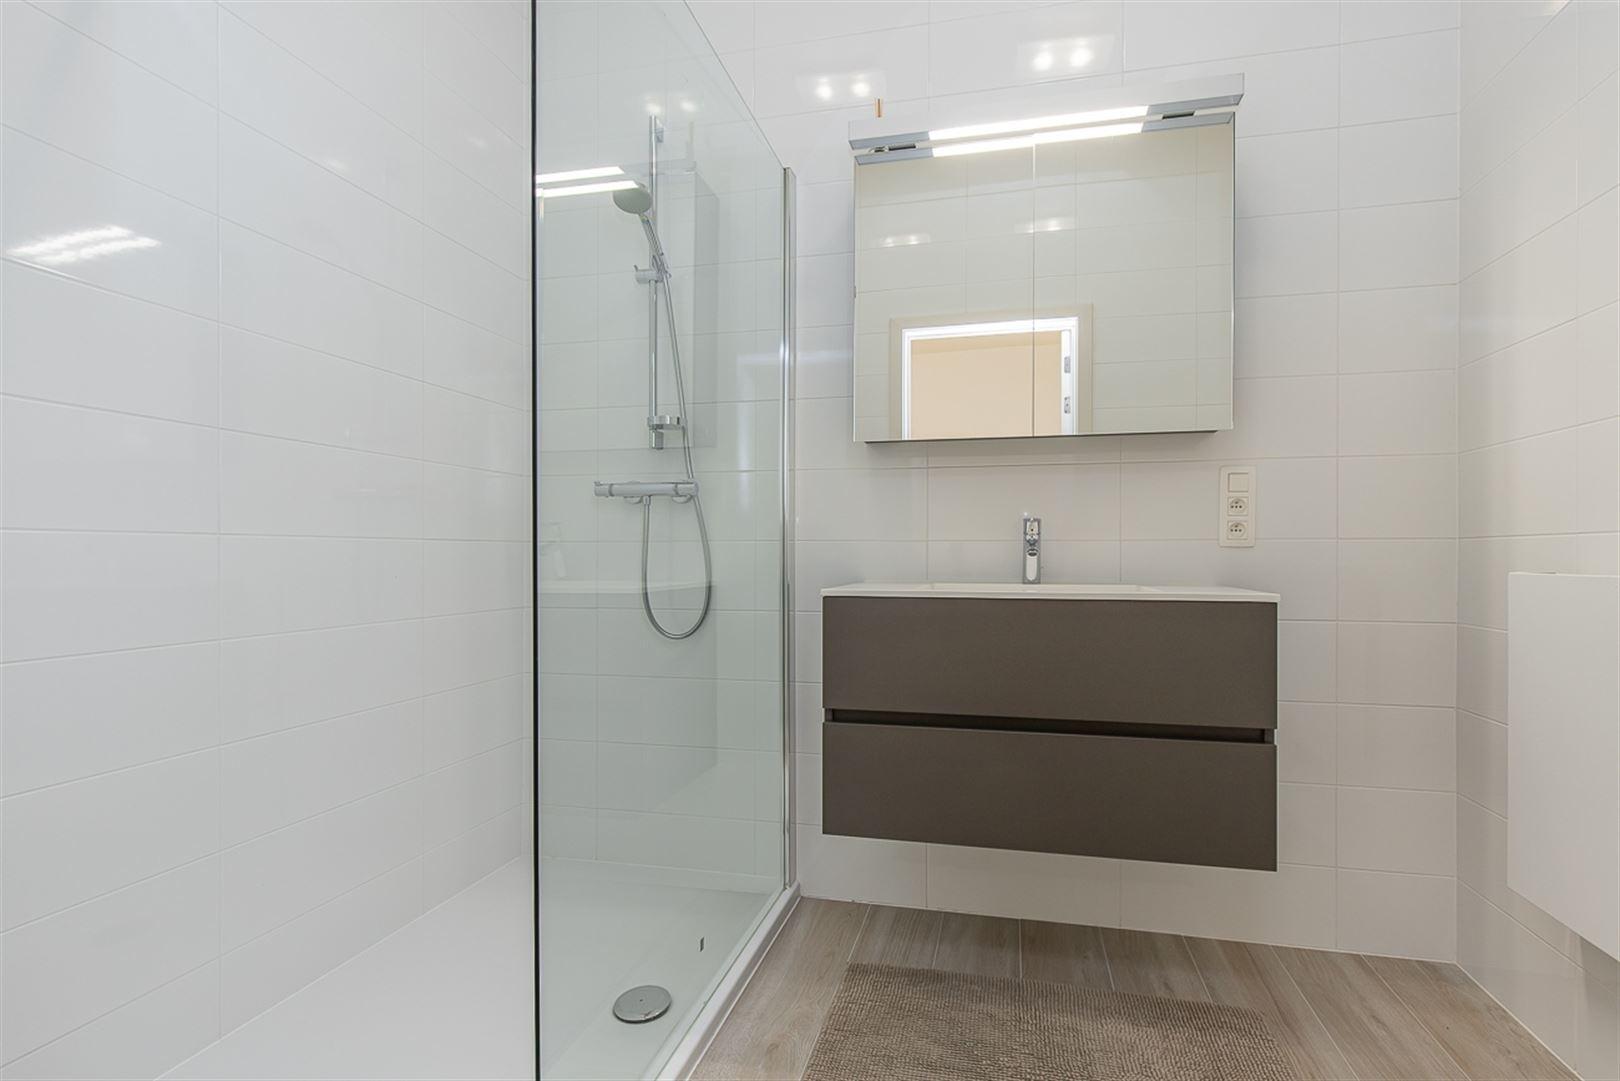 Foto 10 : Duplex/Penthouse te 9200 DENDERMONDE (België) - Prijs € 399.000